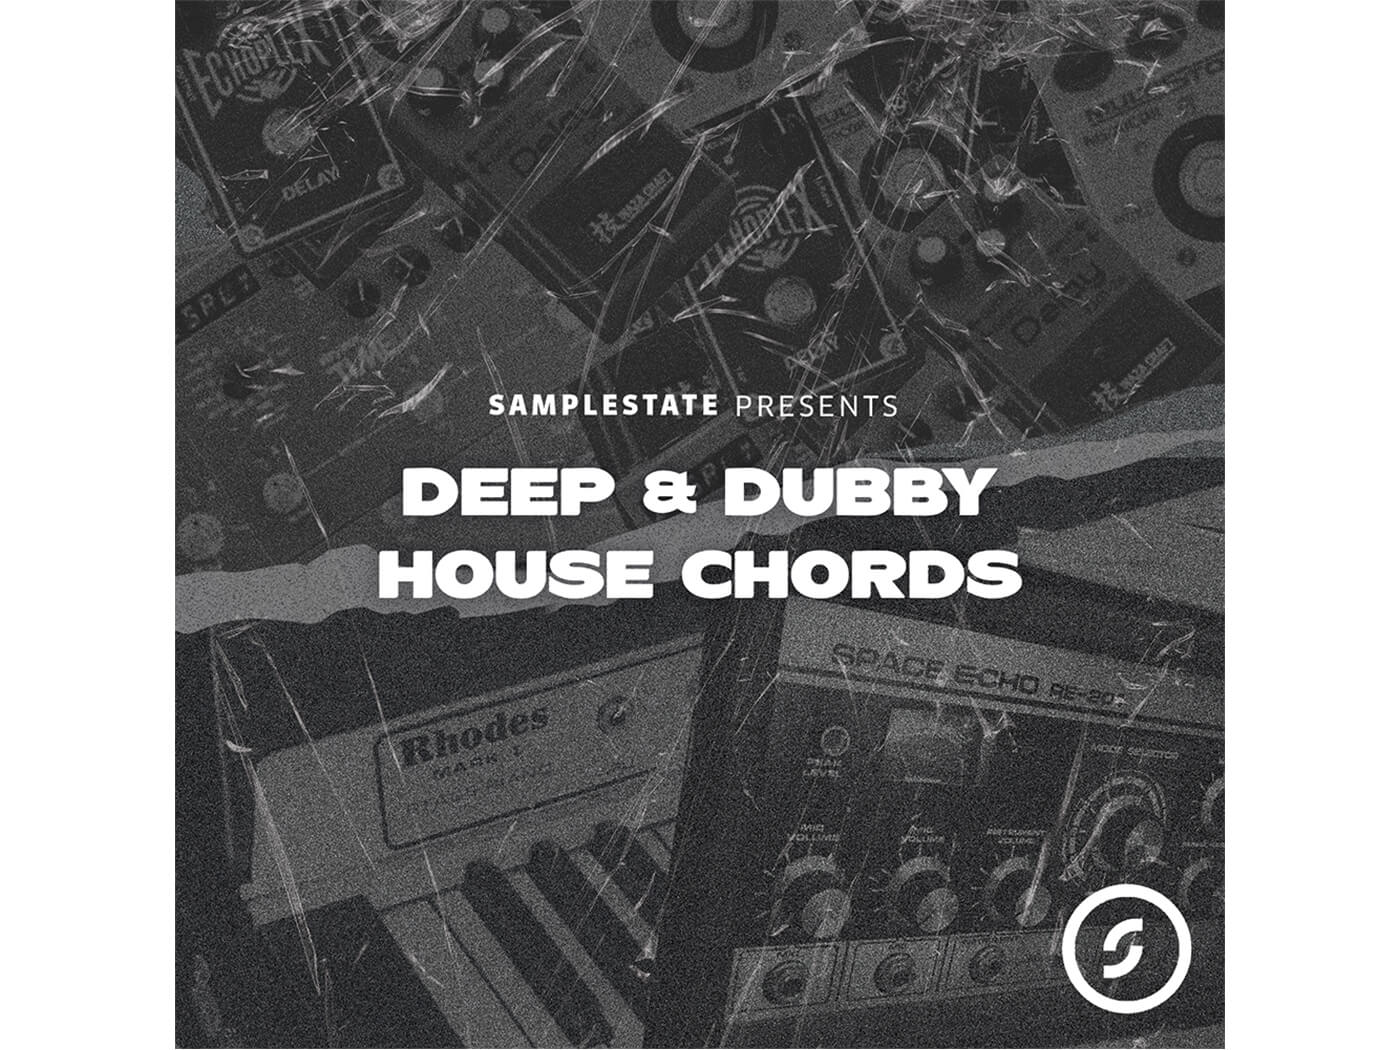 Samplestate - Deep & Dubby House Chords